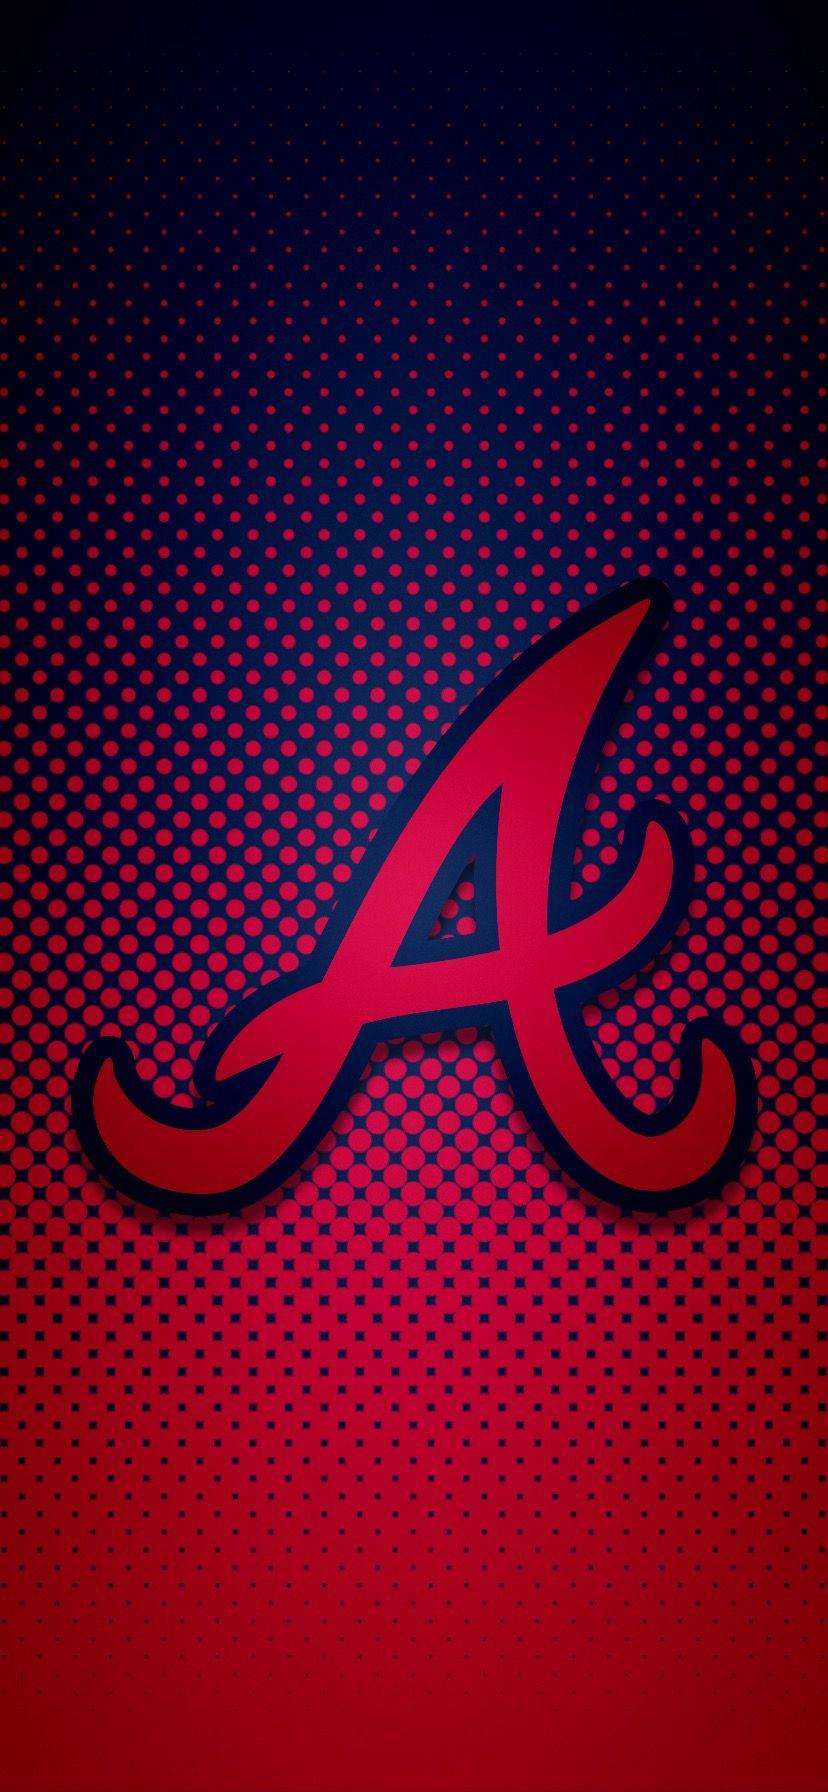 Pin By Jehar On Oppo Wallpapers In 2020 Atlanta Braves Wallpaper Baseball Wallpaper Braves Baseball